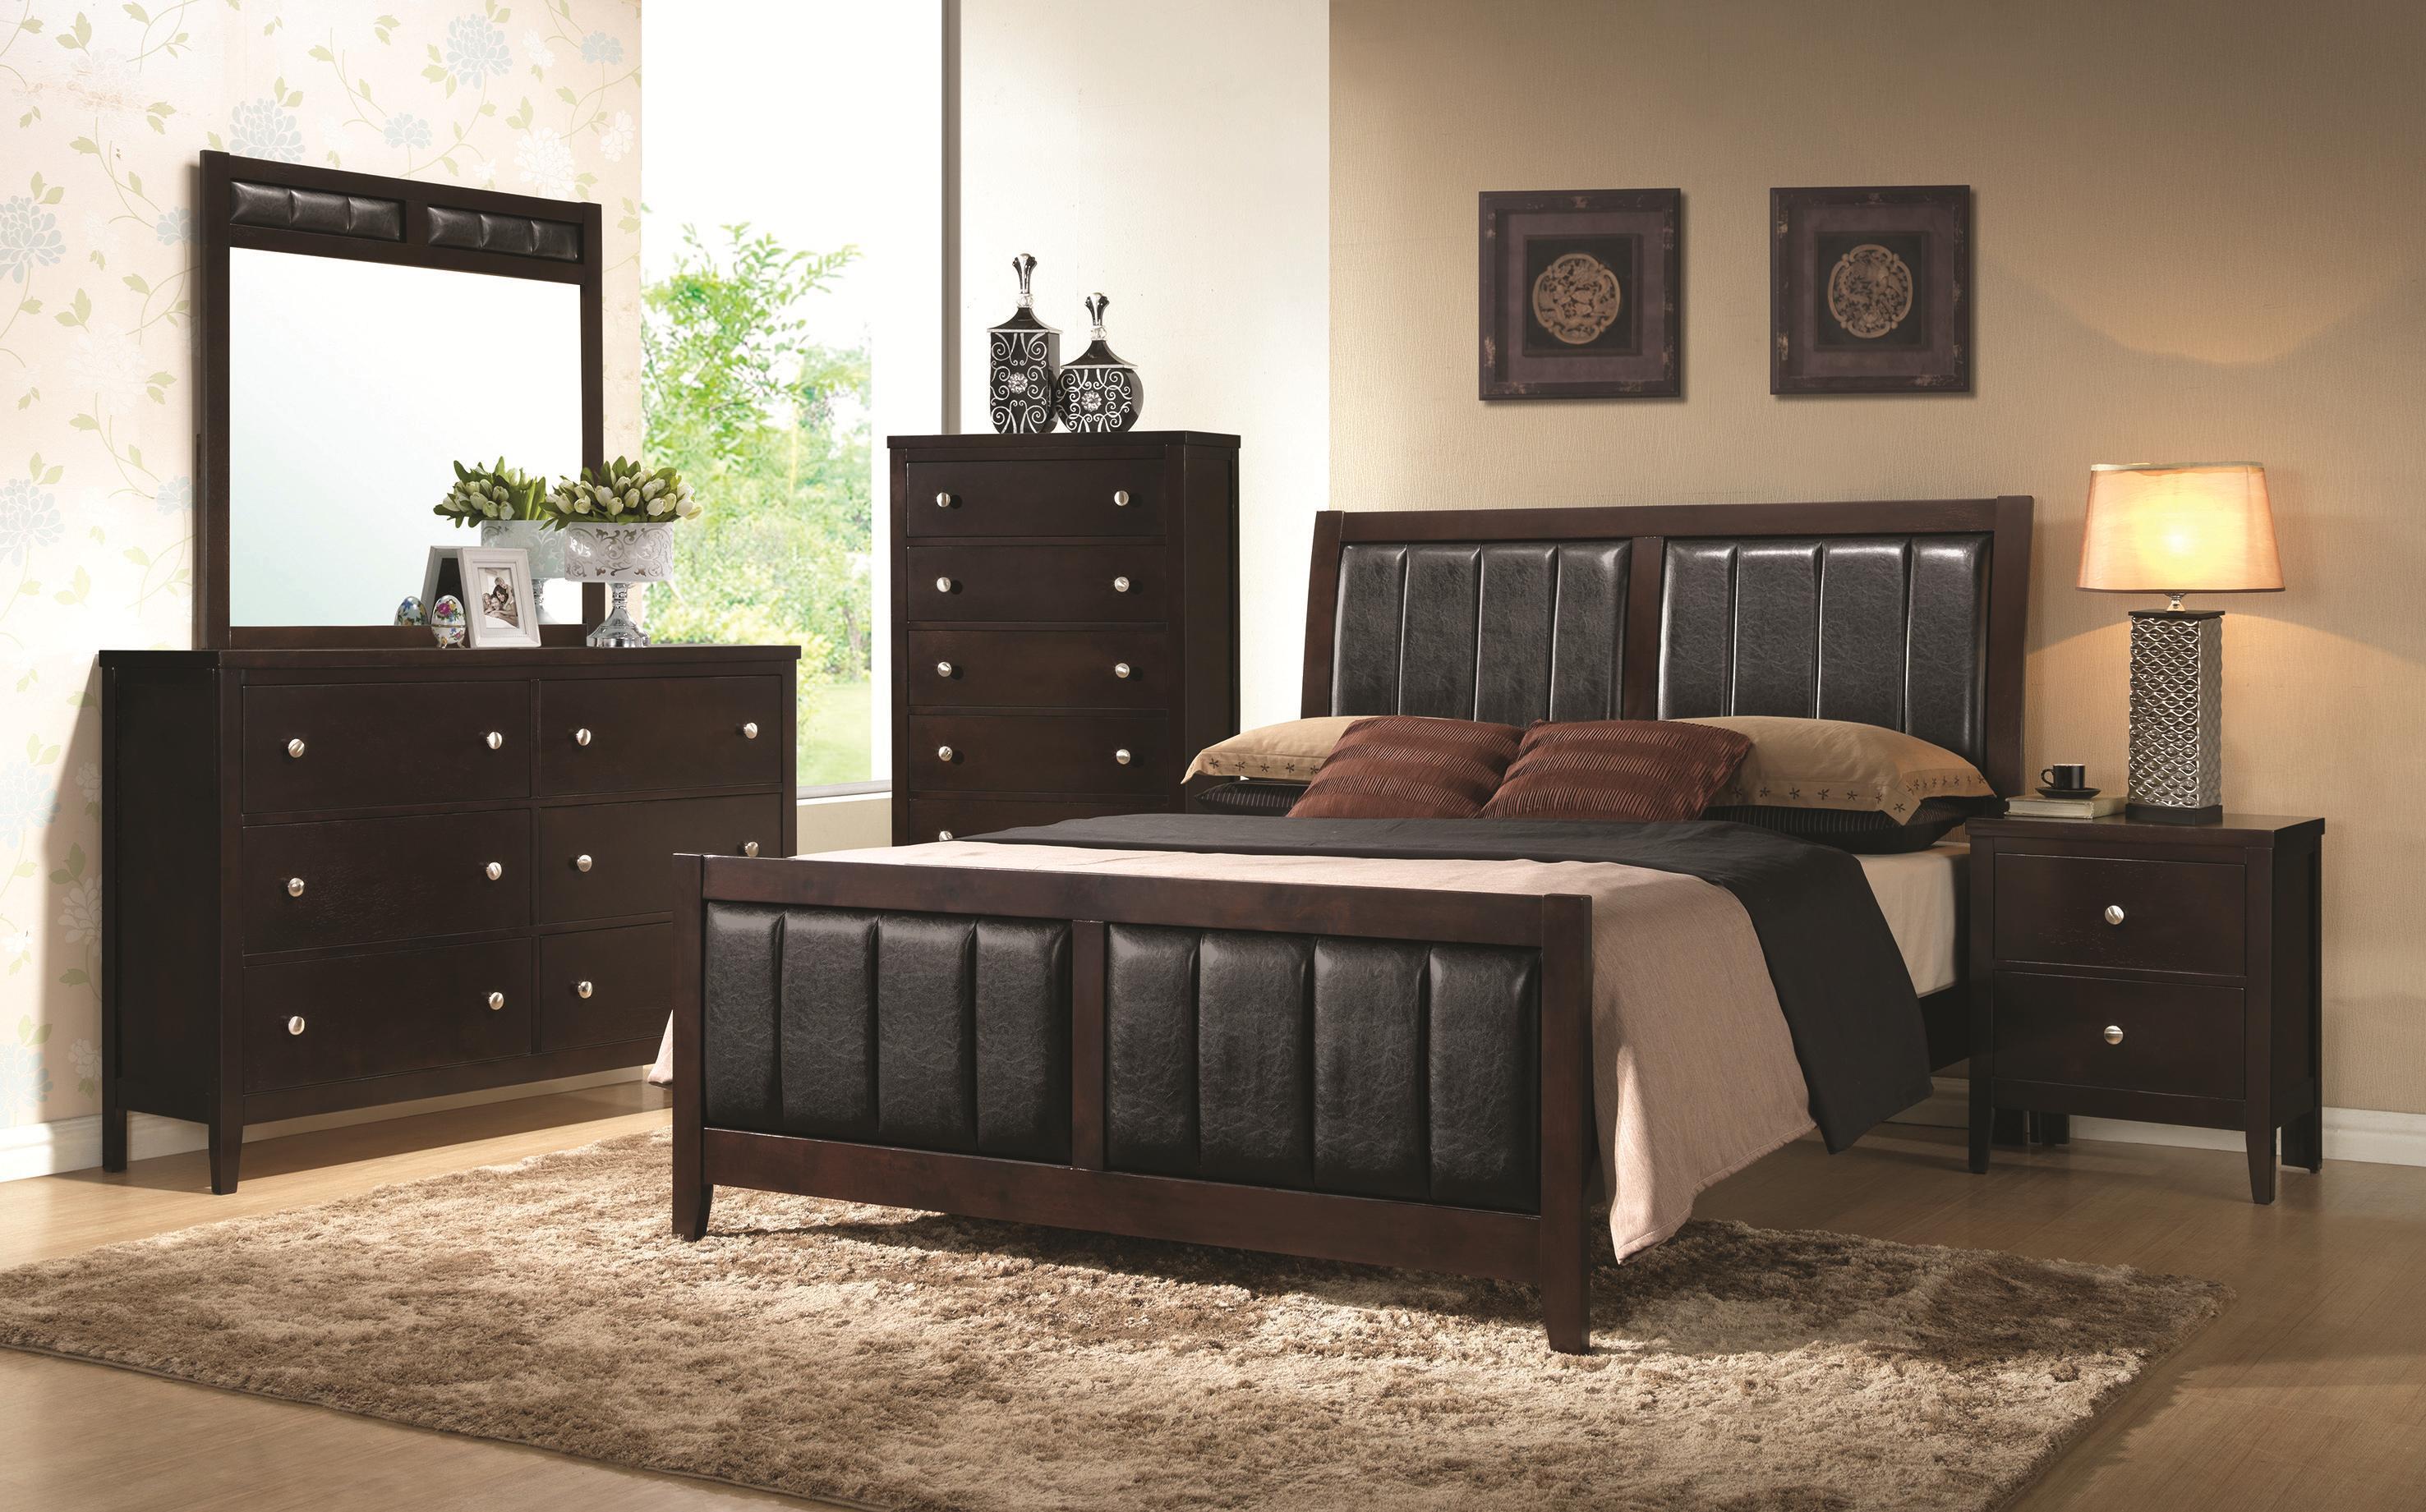 Coaster Carlton California King Bedroom Group - Item Number: 20209 CK Bedroom Group